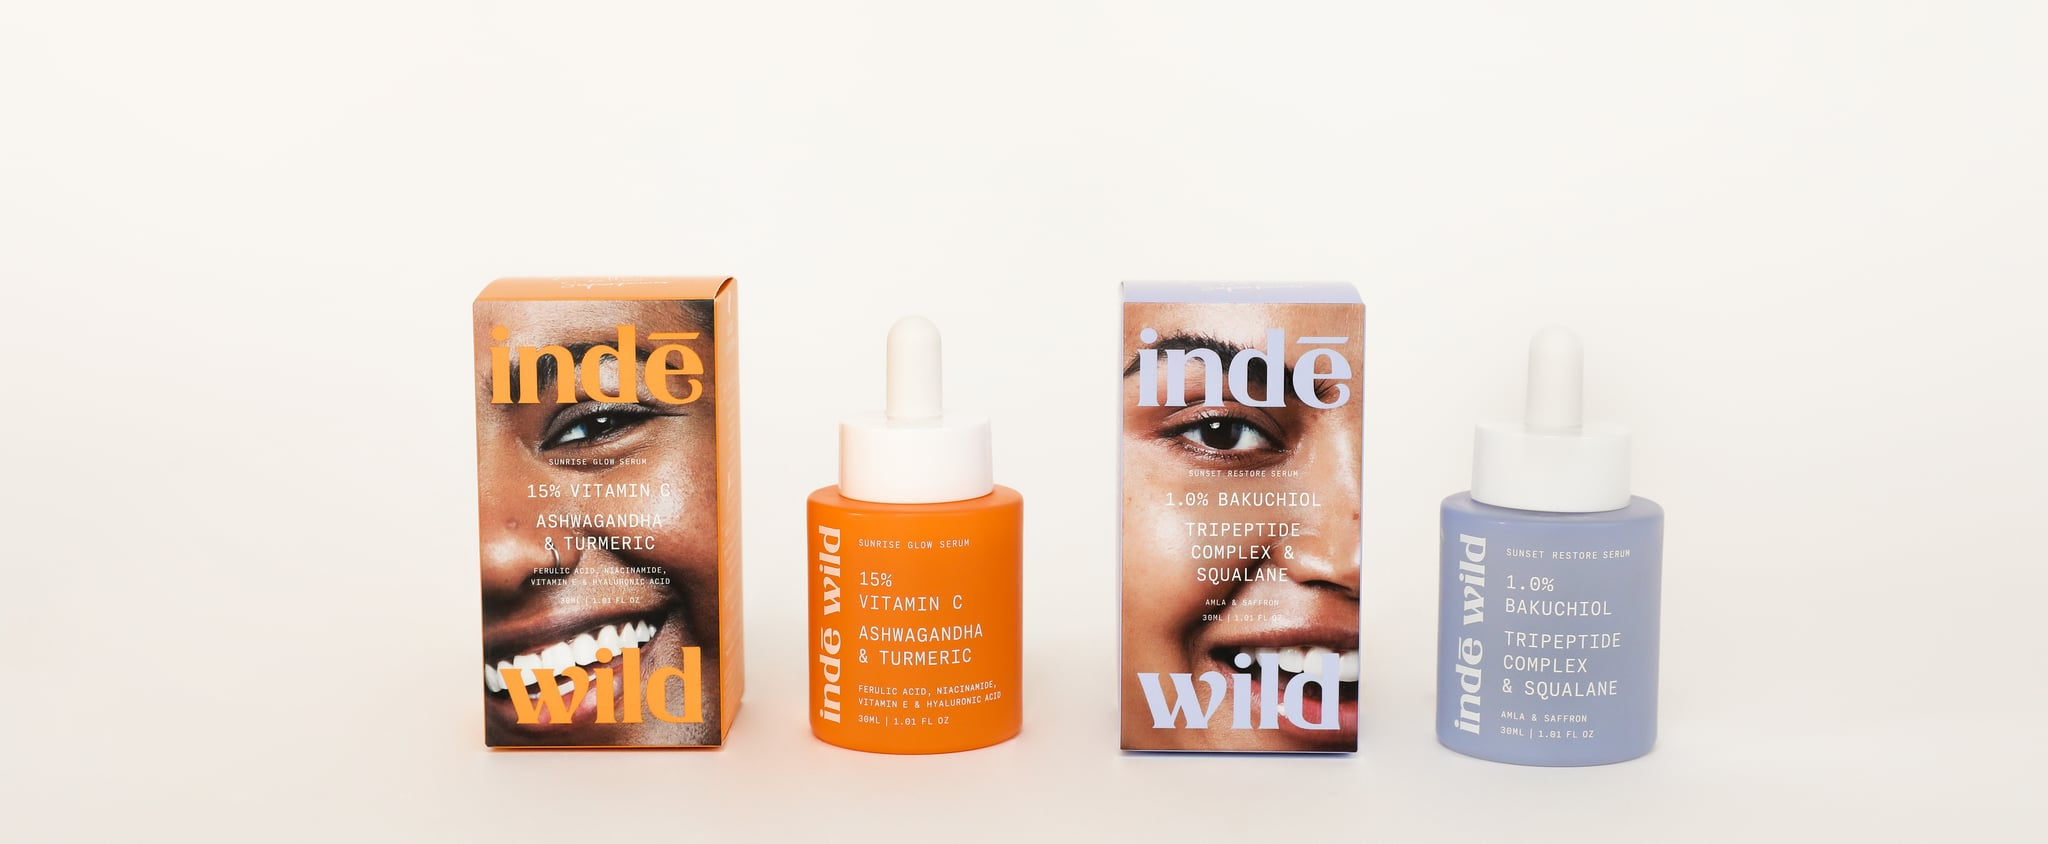 Indē Wild's Diipa Büller-Khosla on South Asian Skin Care